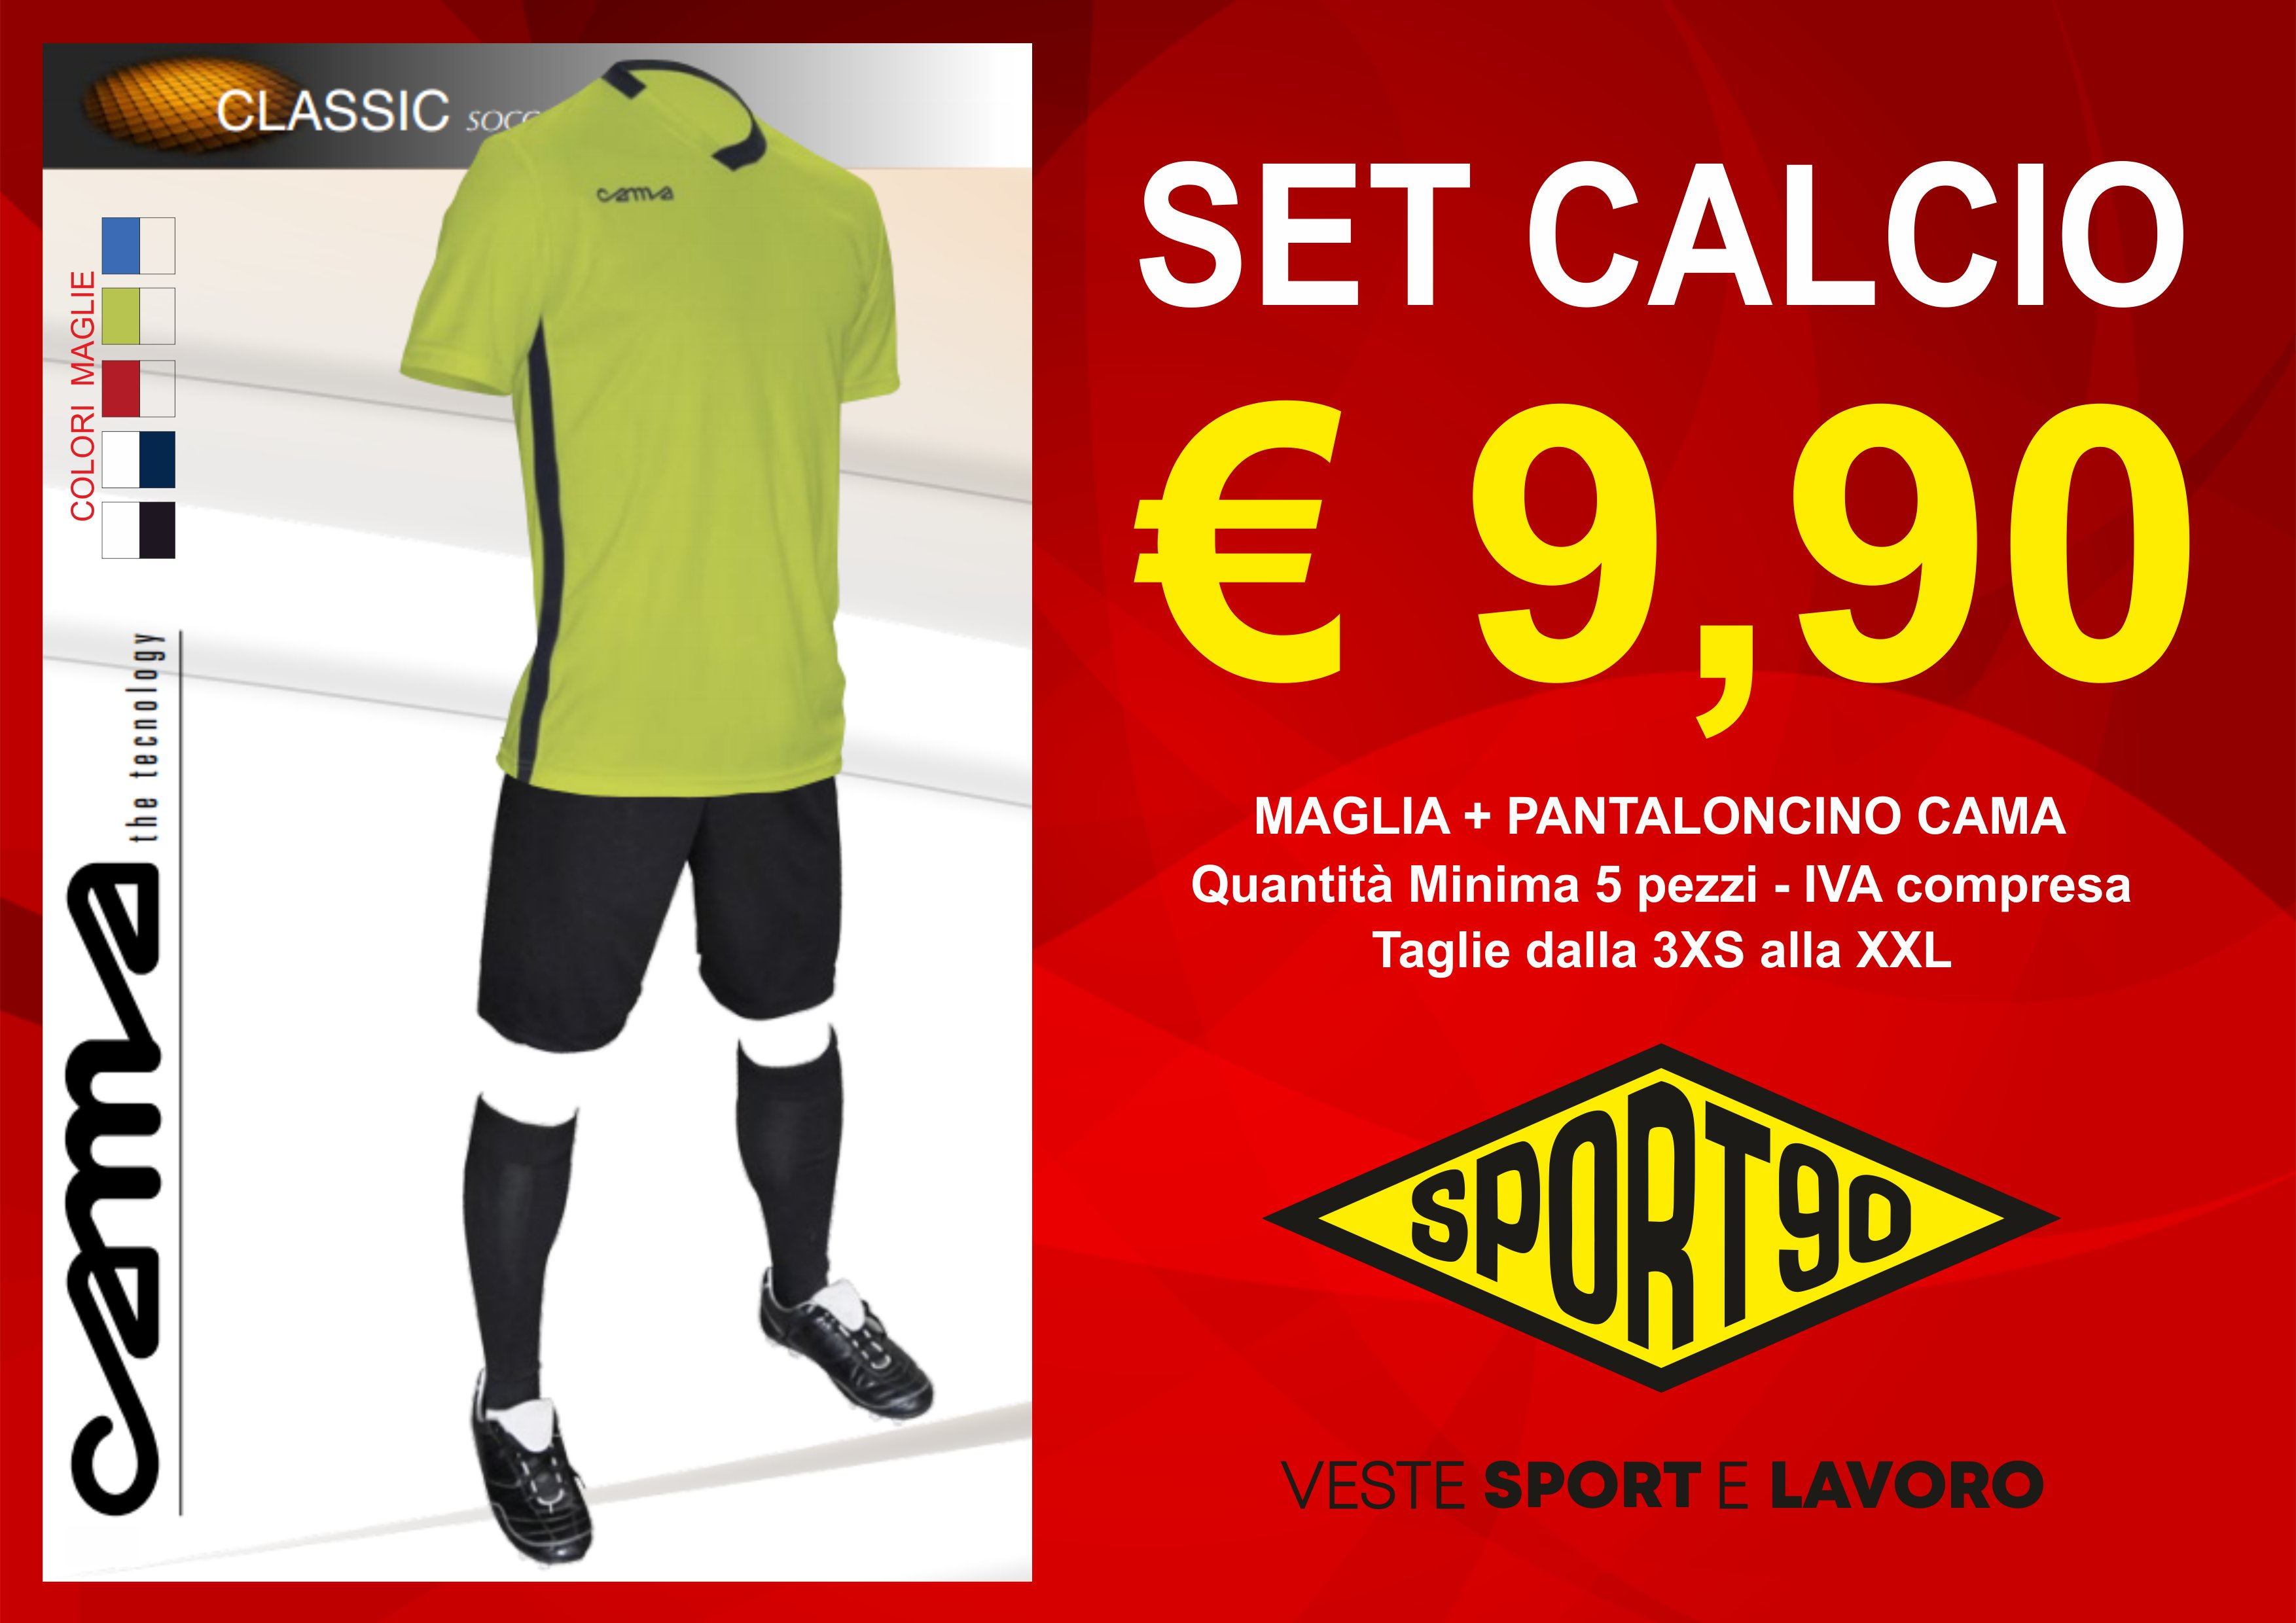 Set maglia e pantlaoncino calcio cama sport90 sport 90